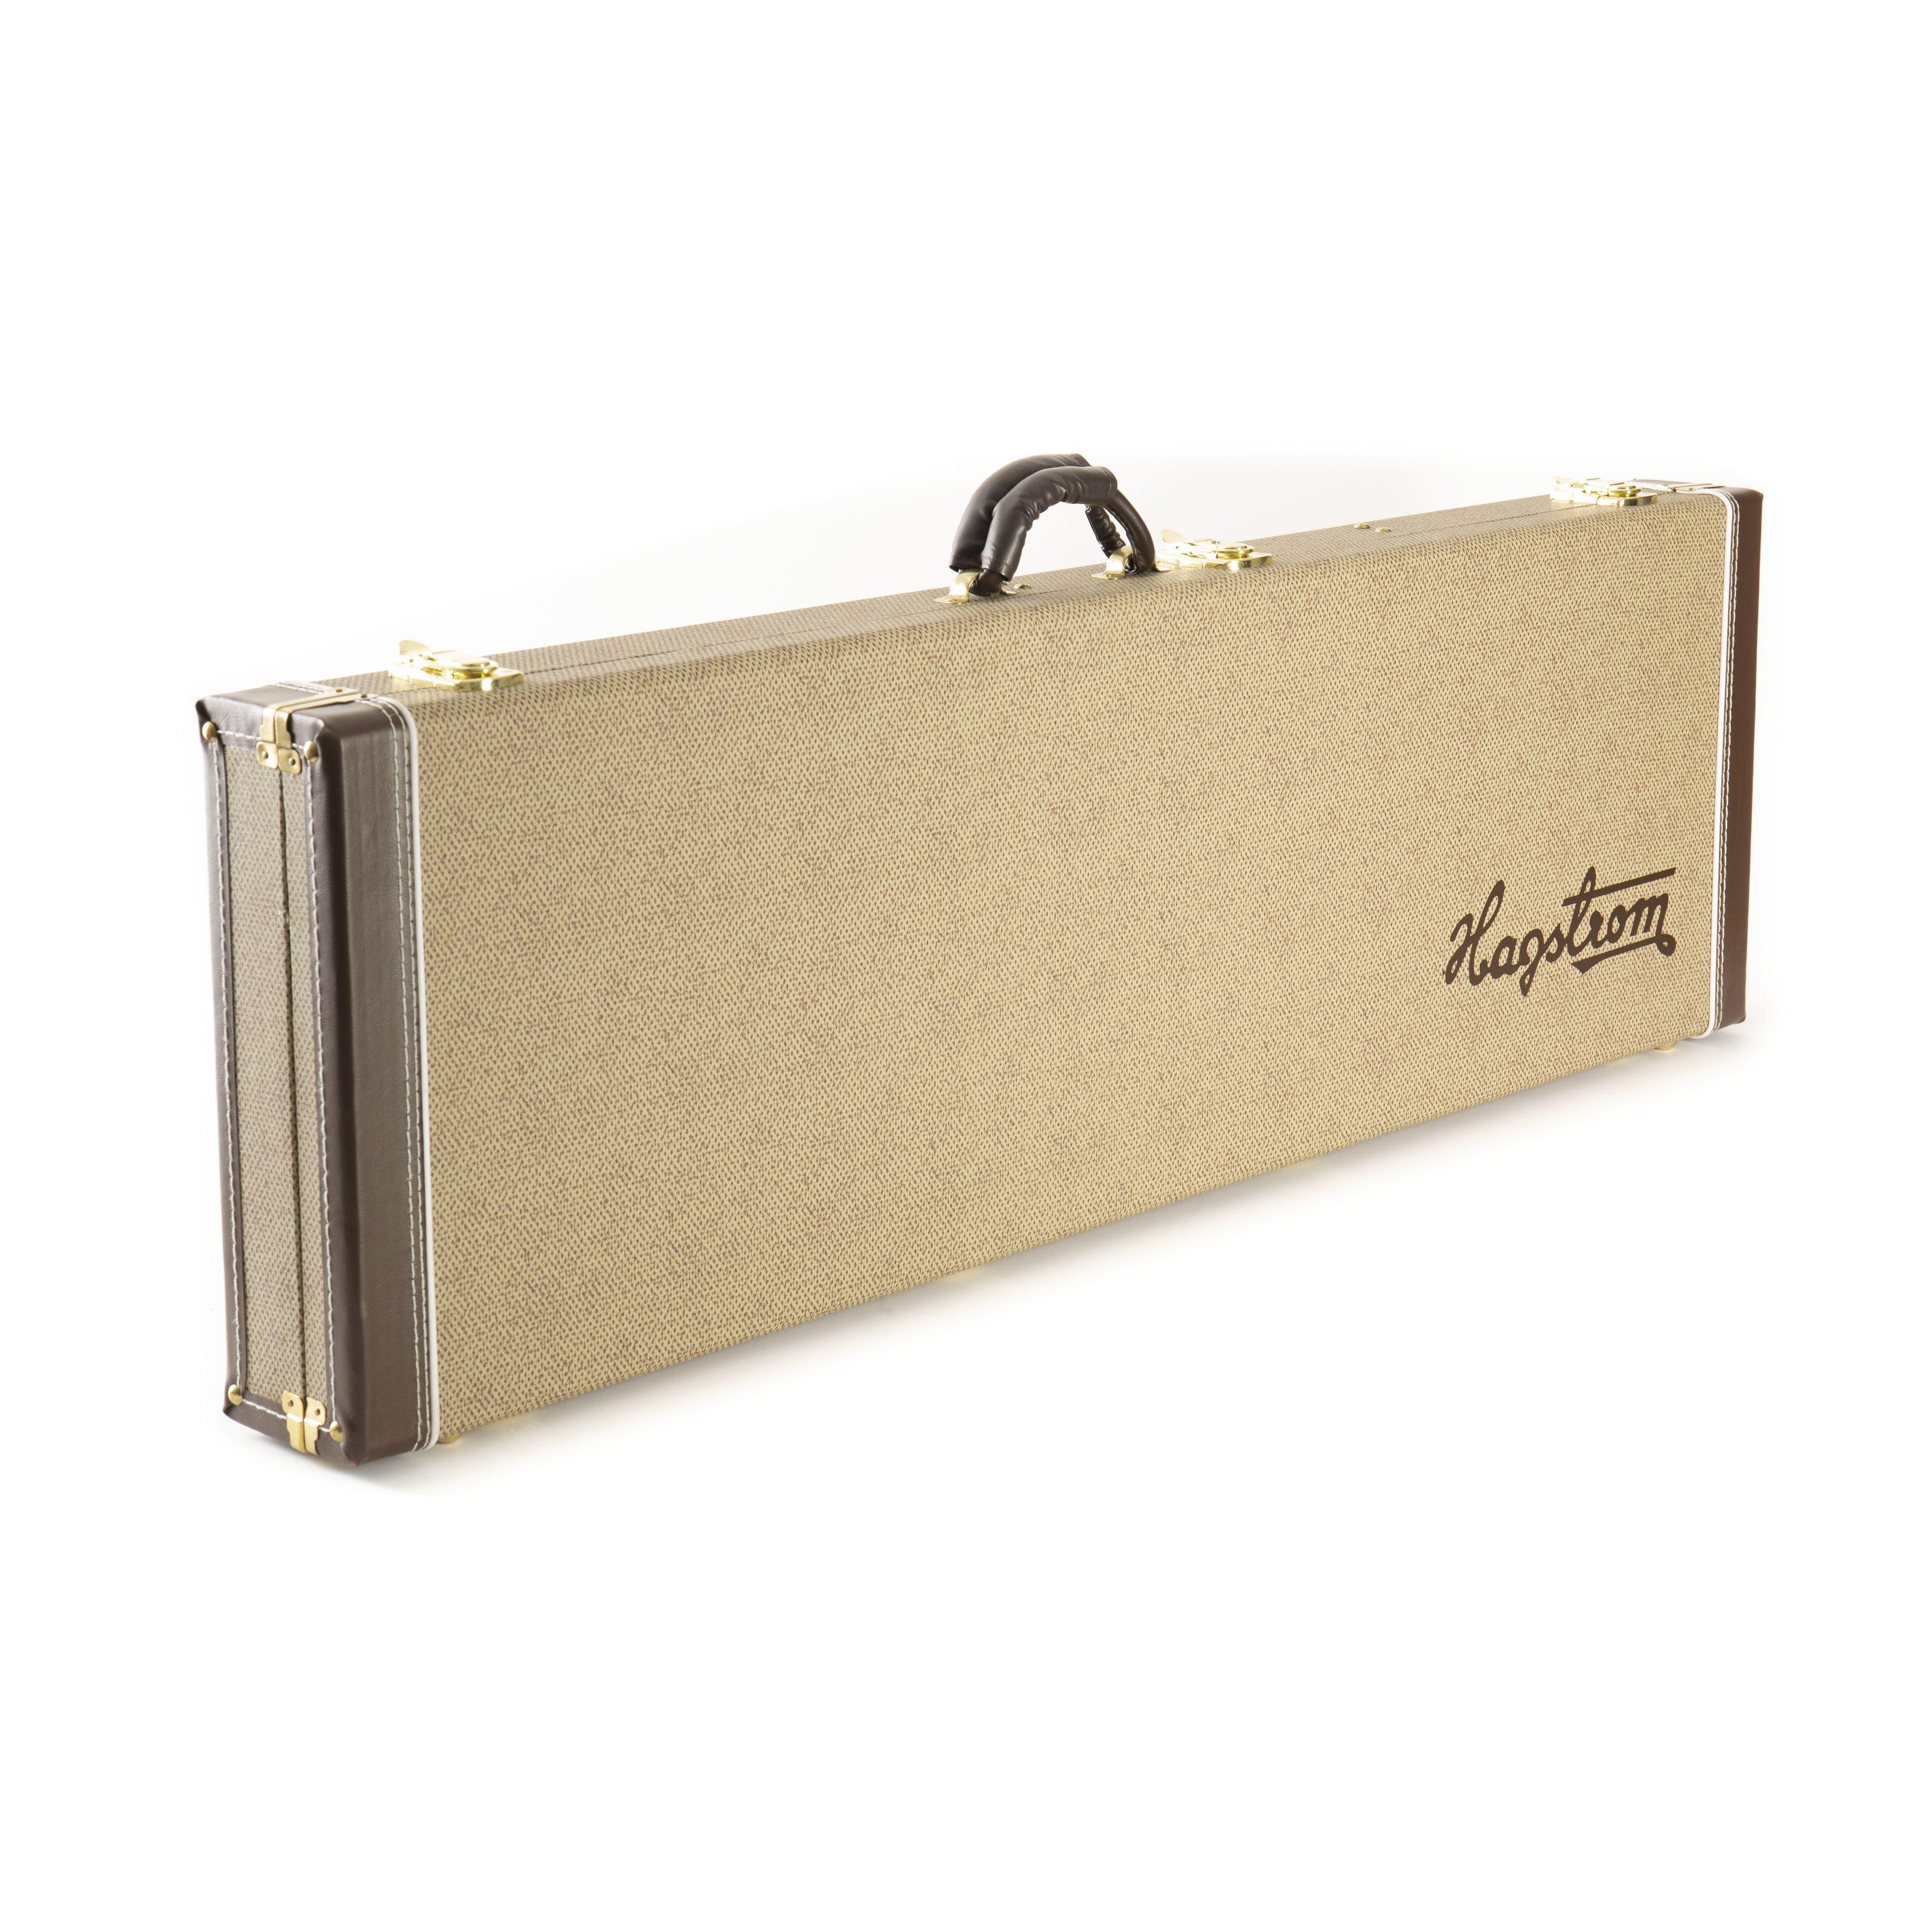 Hagstrom - CB-60 Bass Case